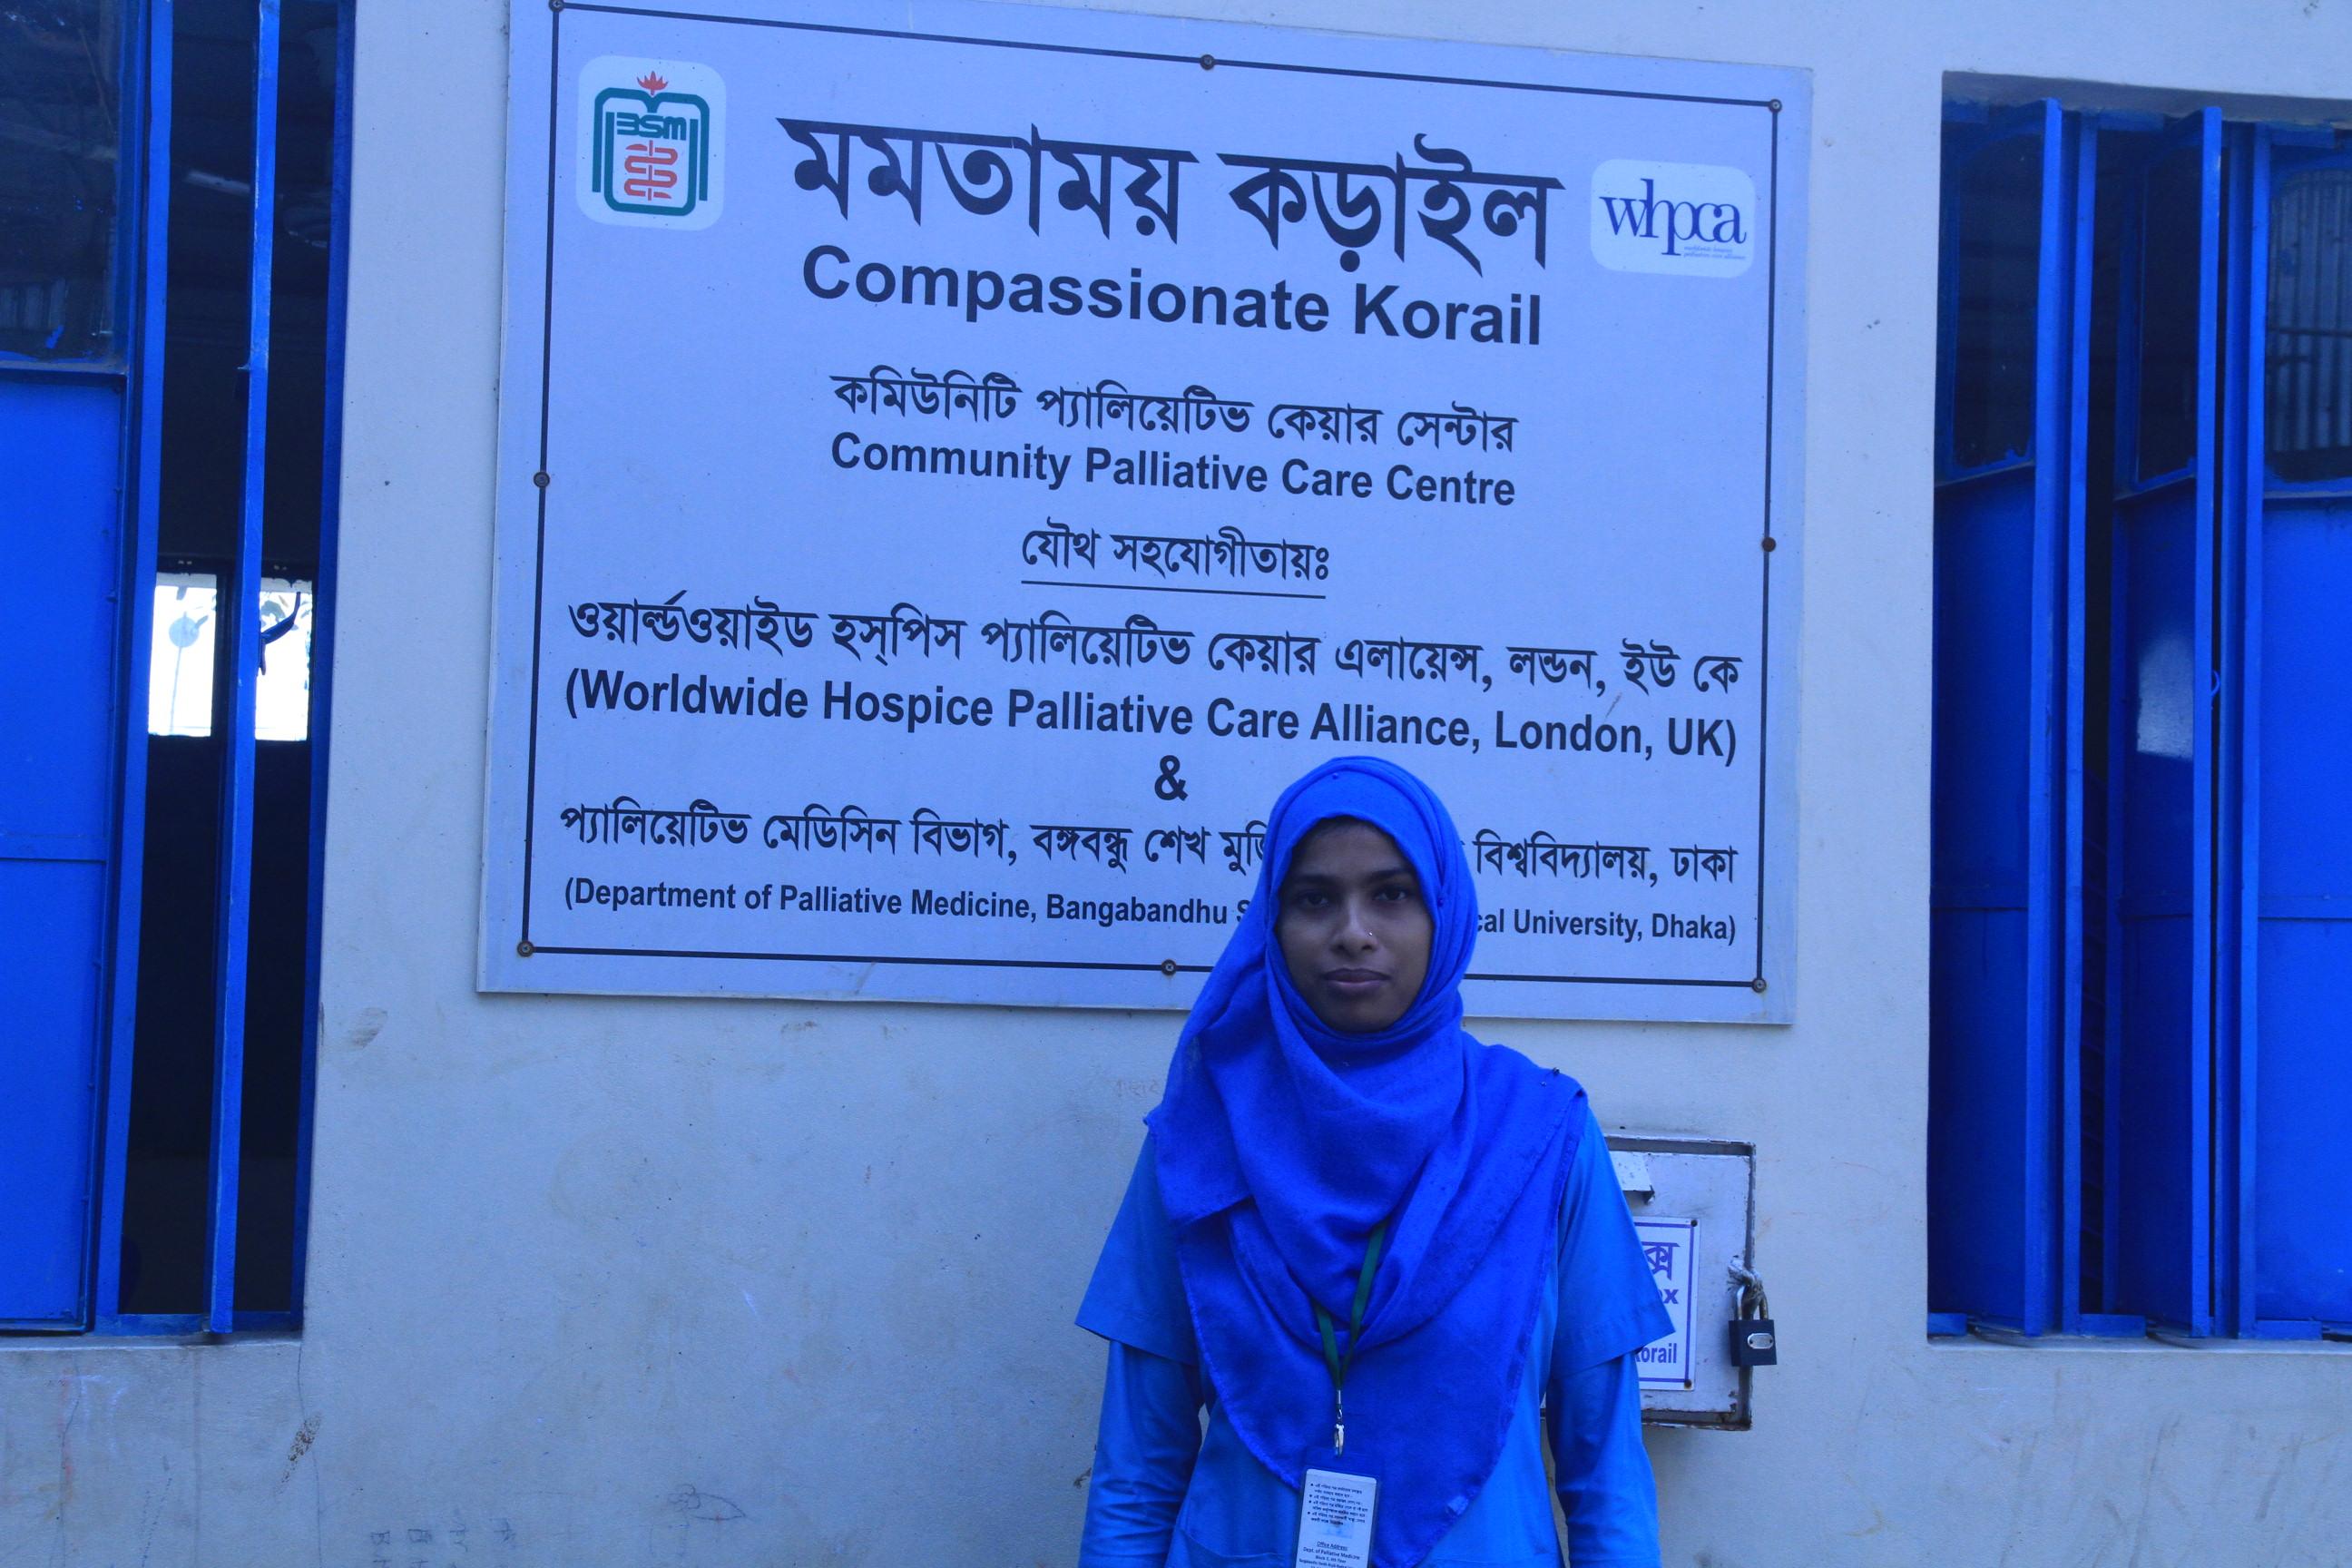 Meet the young women providing community palliative care in Bangladesh – Kulsum Akter